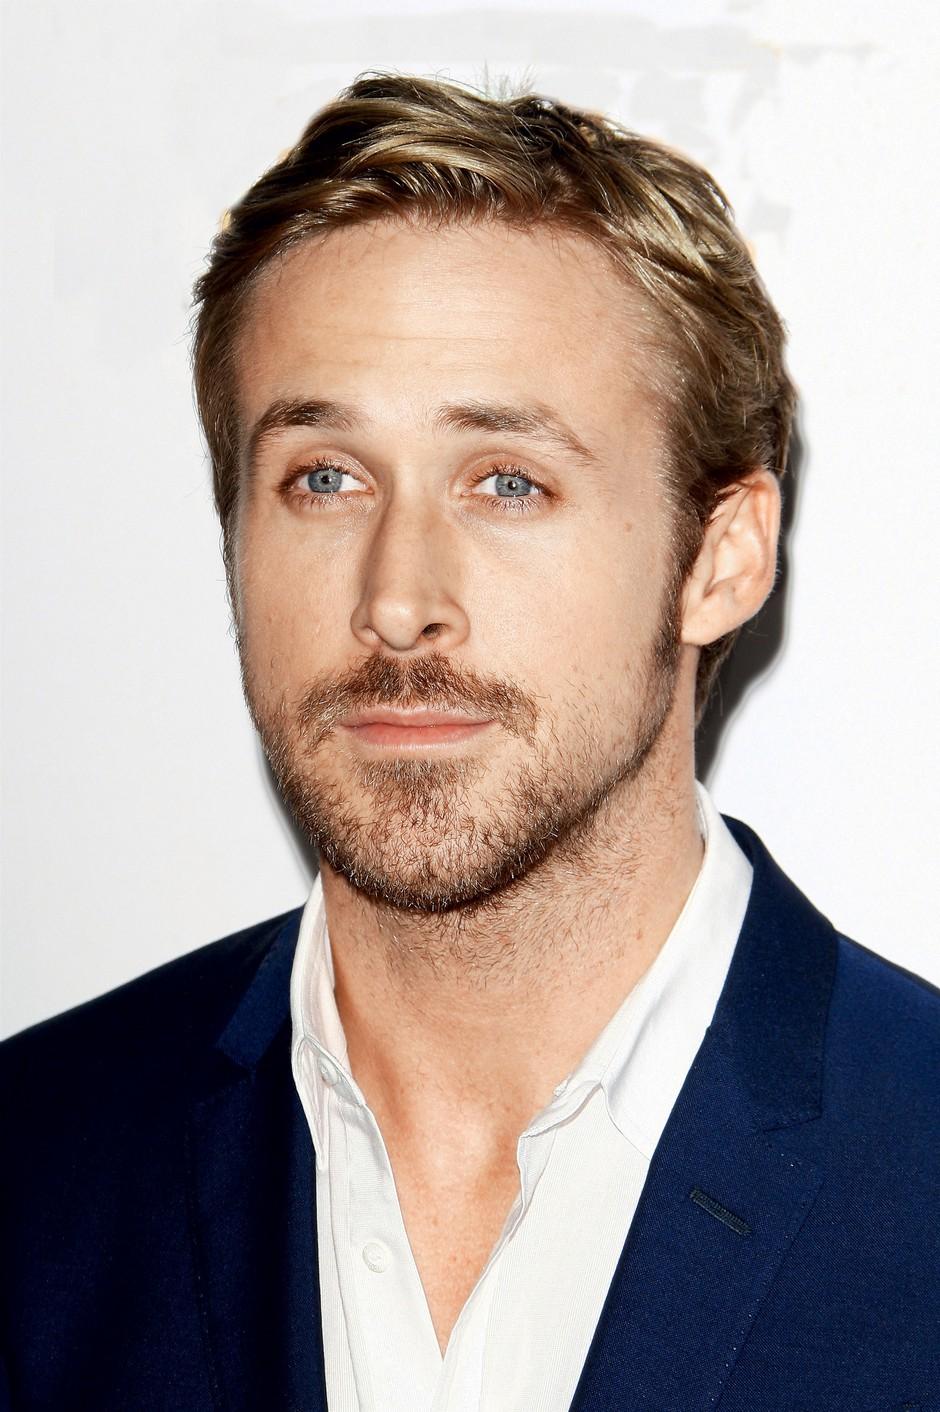 Ryan Gosling - to vidi on... (foto: Eric Ray Davidson, Profimedia.si, Jason Todd, Shutterstock)